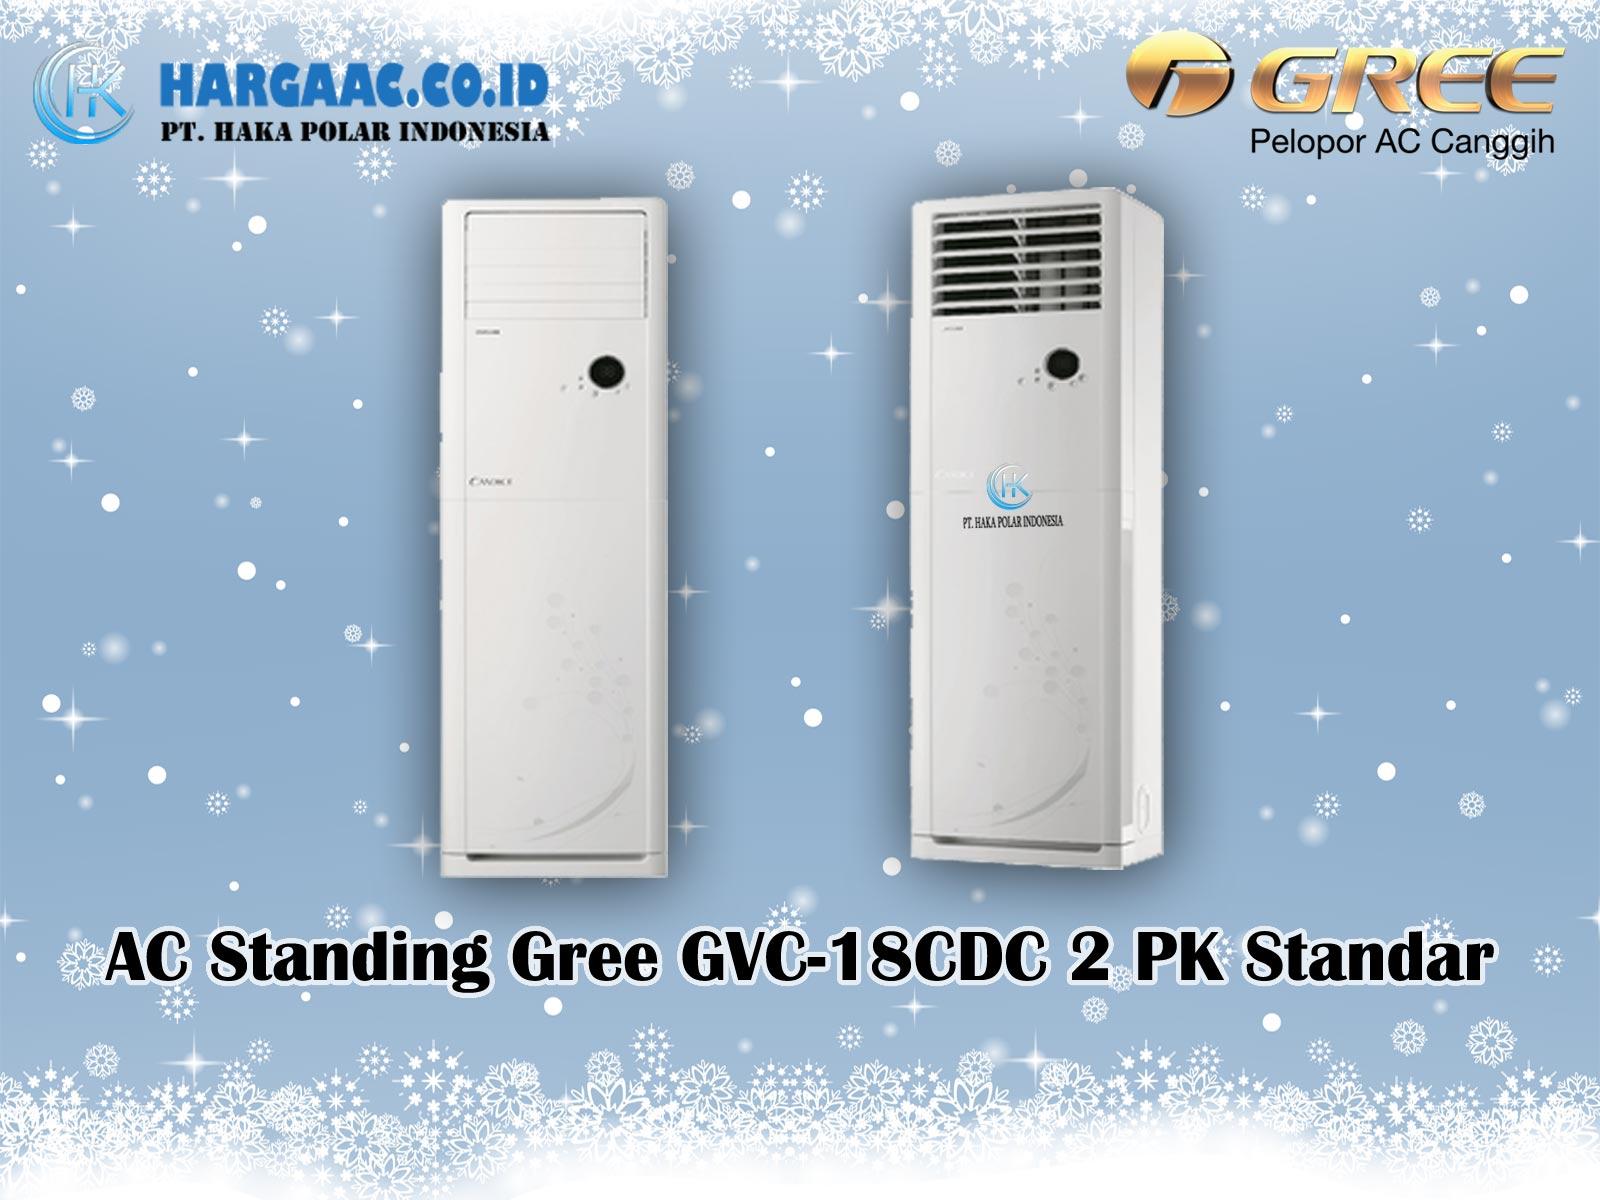 Harga Jual AC Standing Gree GVC 18CDC 2 PK Standar